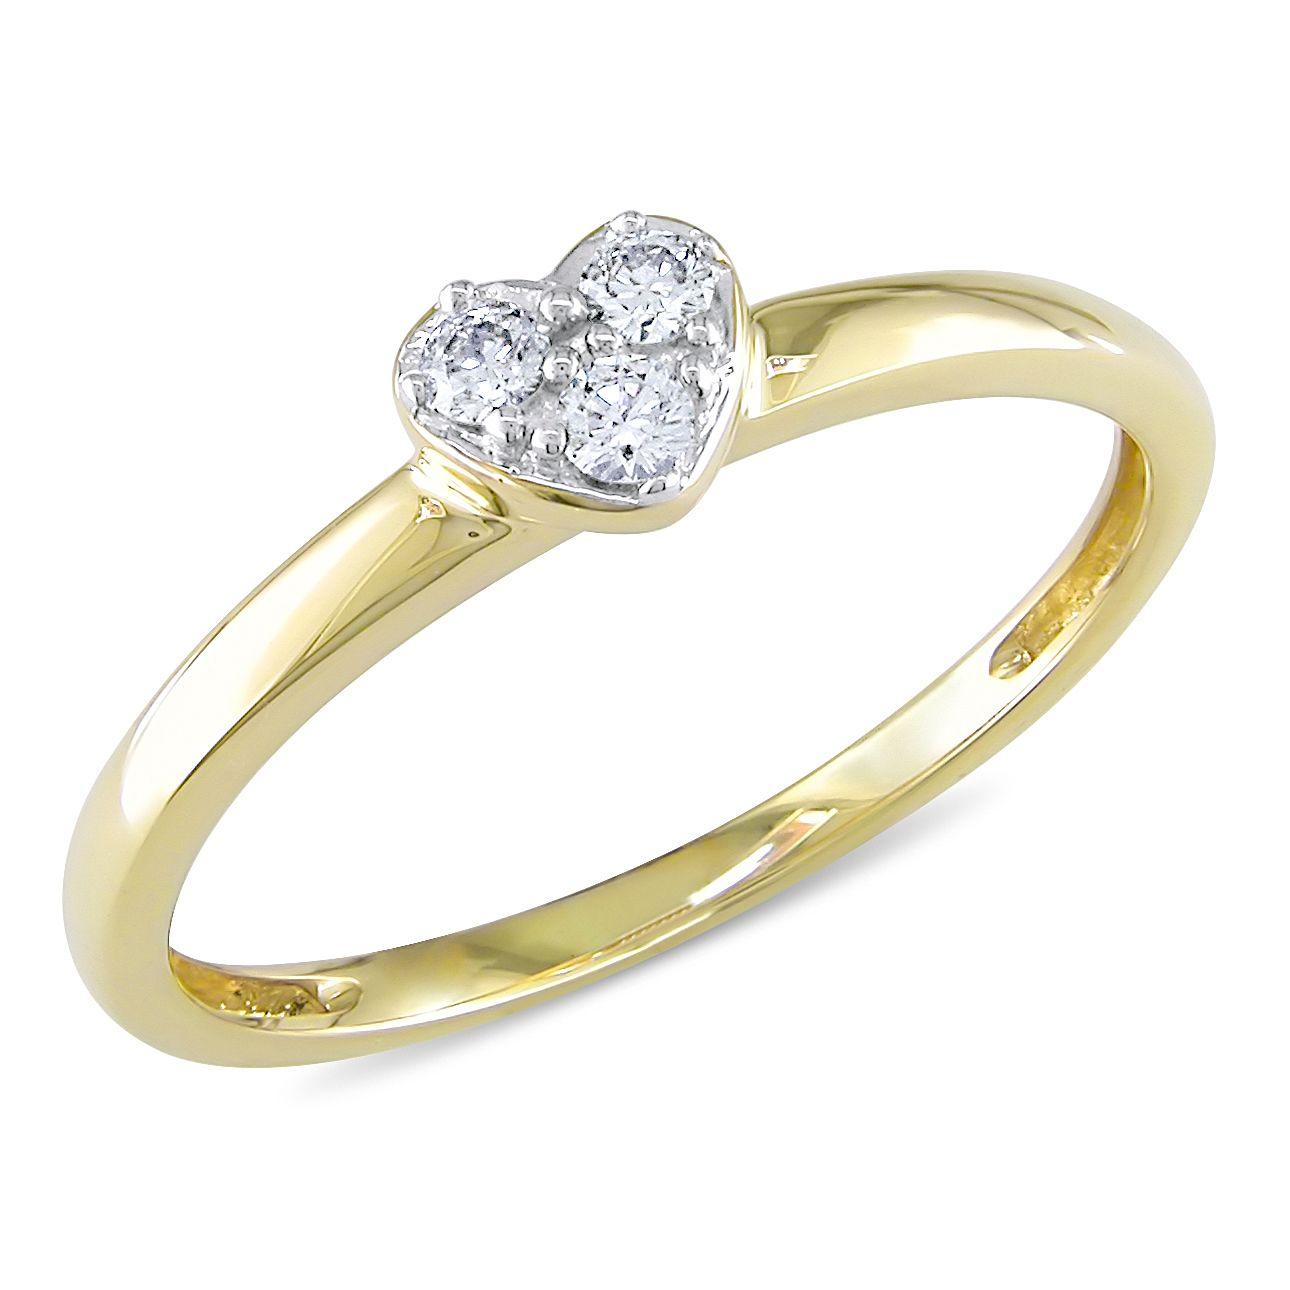 overstock wedding rings Miadora 10k Yellow Gold 1 10ct TDW Diamond Heart Promise Ring G H I2